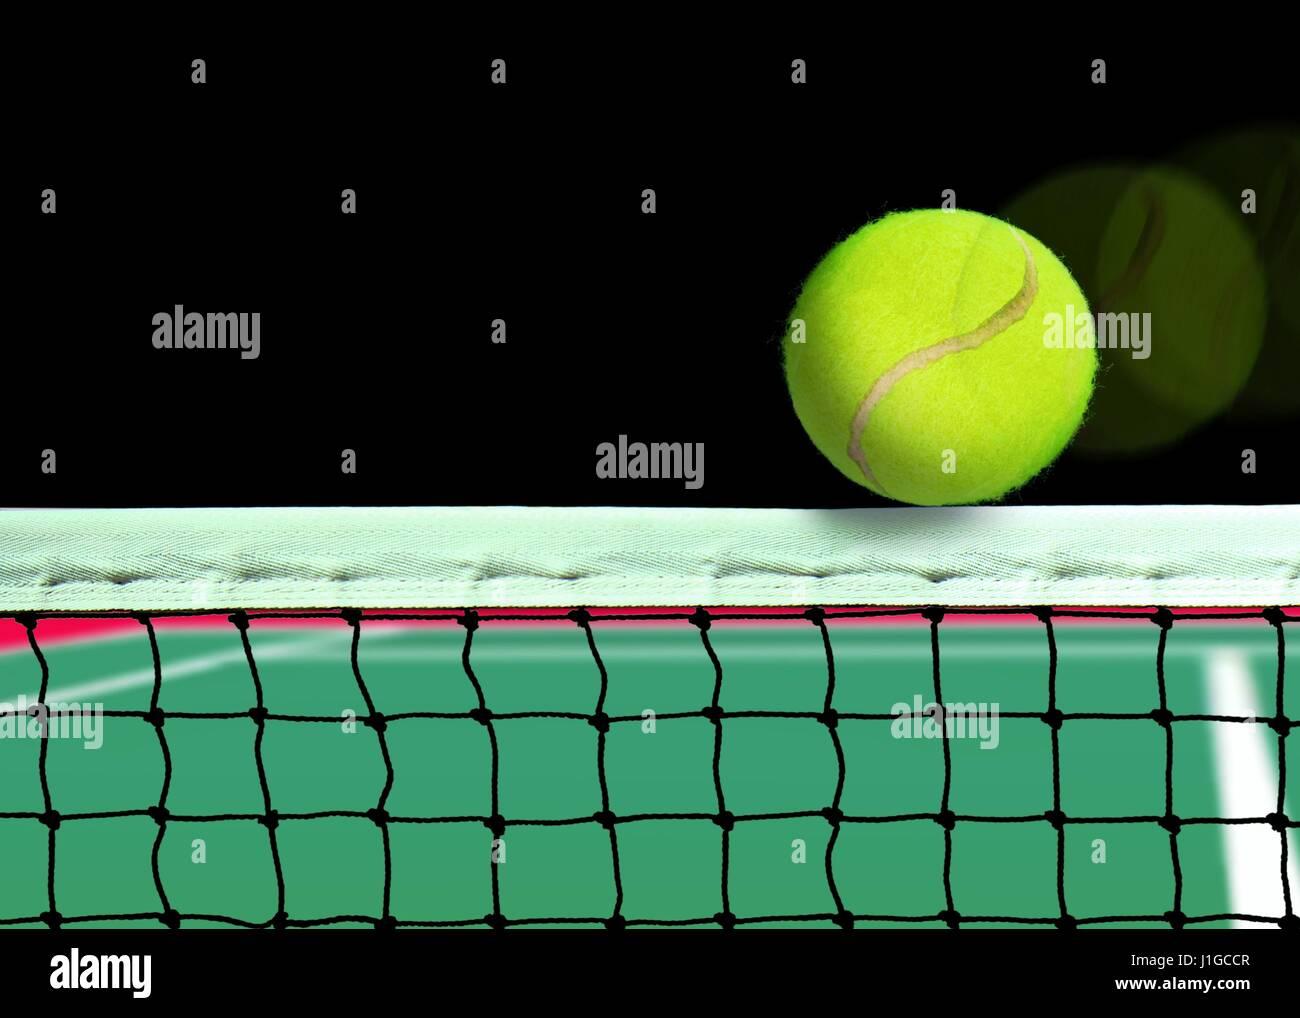 Tennis ball mascot stock photos tennis ball mascot stock photography - Tennis Ball On The Net Stock Image